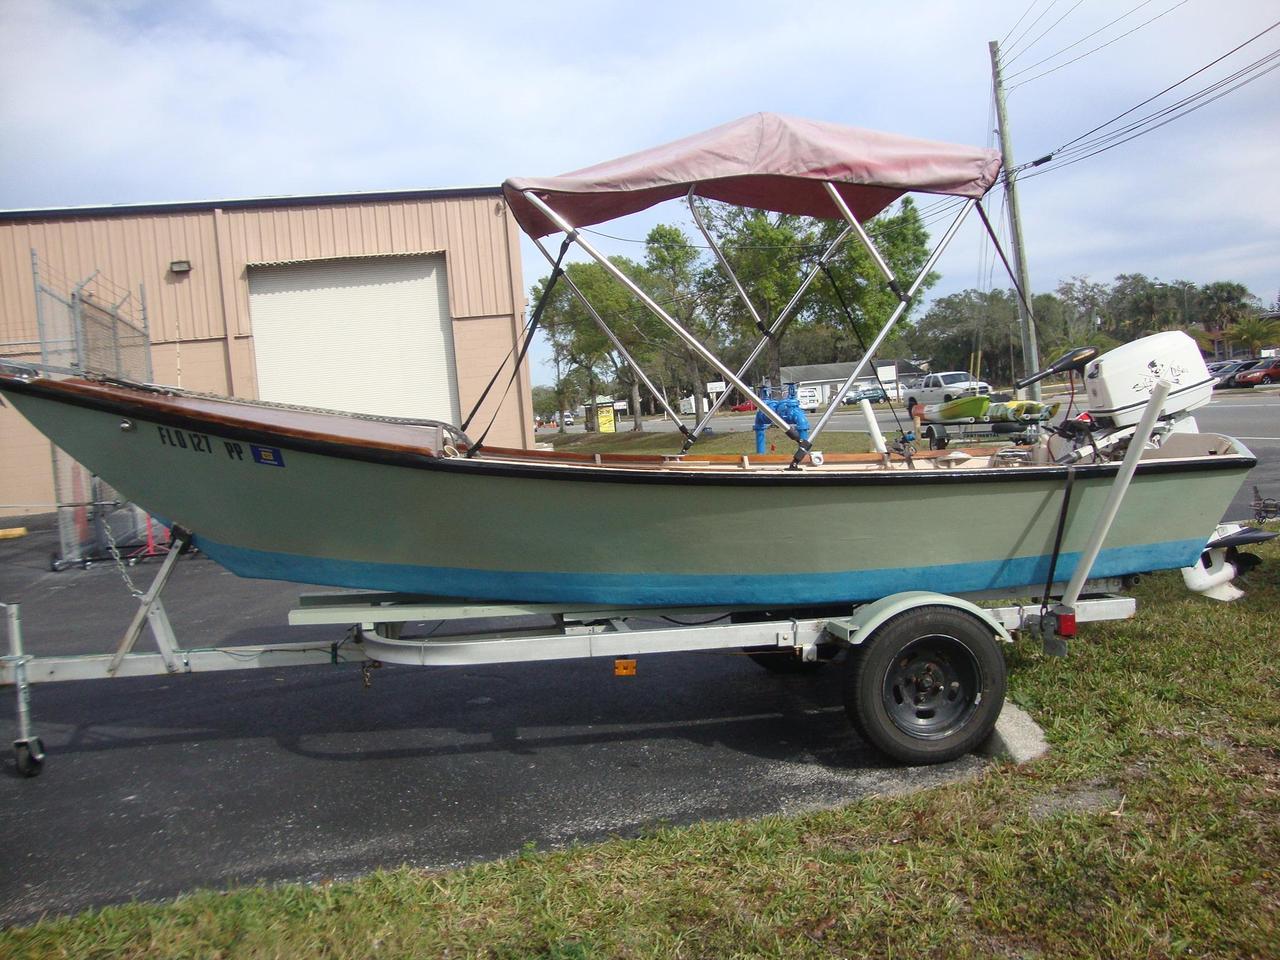 2013 used new england boatworks dori personal watercraft. Black Bedroom Furniture Sets. Home Design Ideas